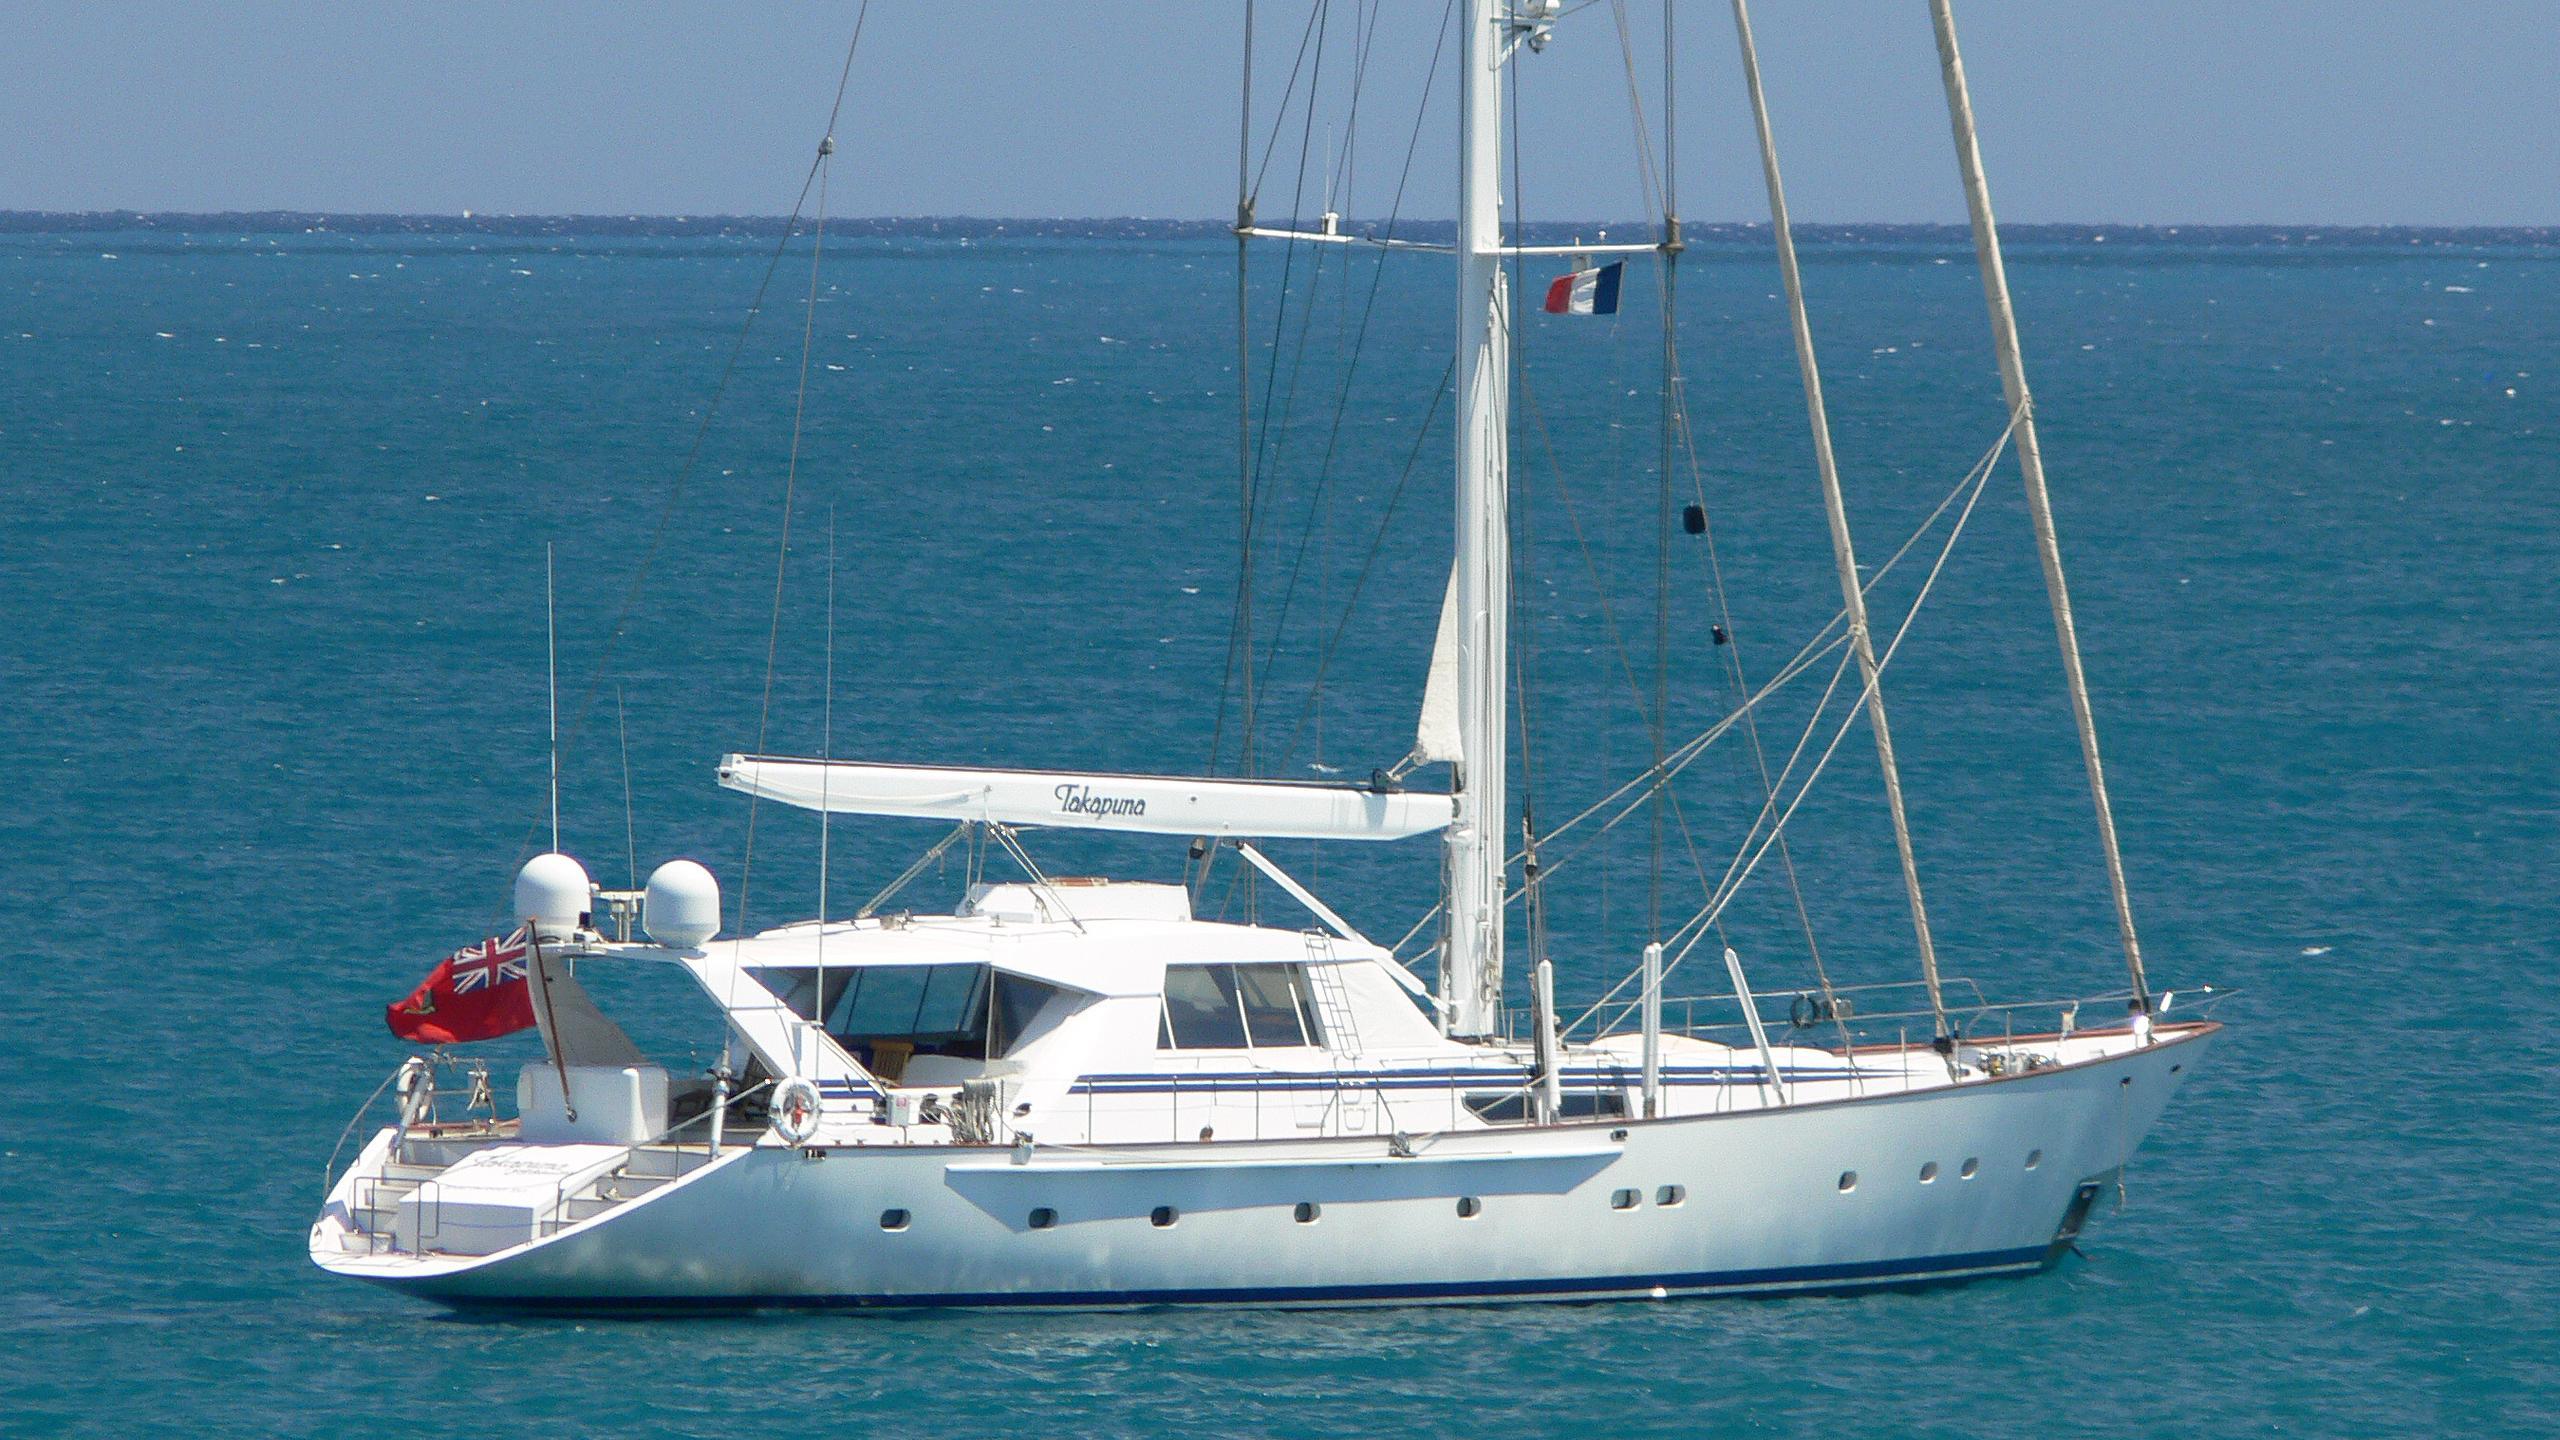 takapuna-sailing-yacht-valdettaro-112-1994-34m-half-profile